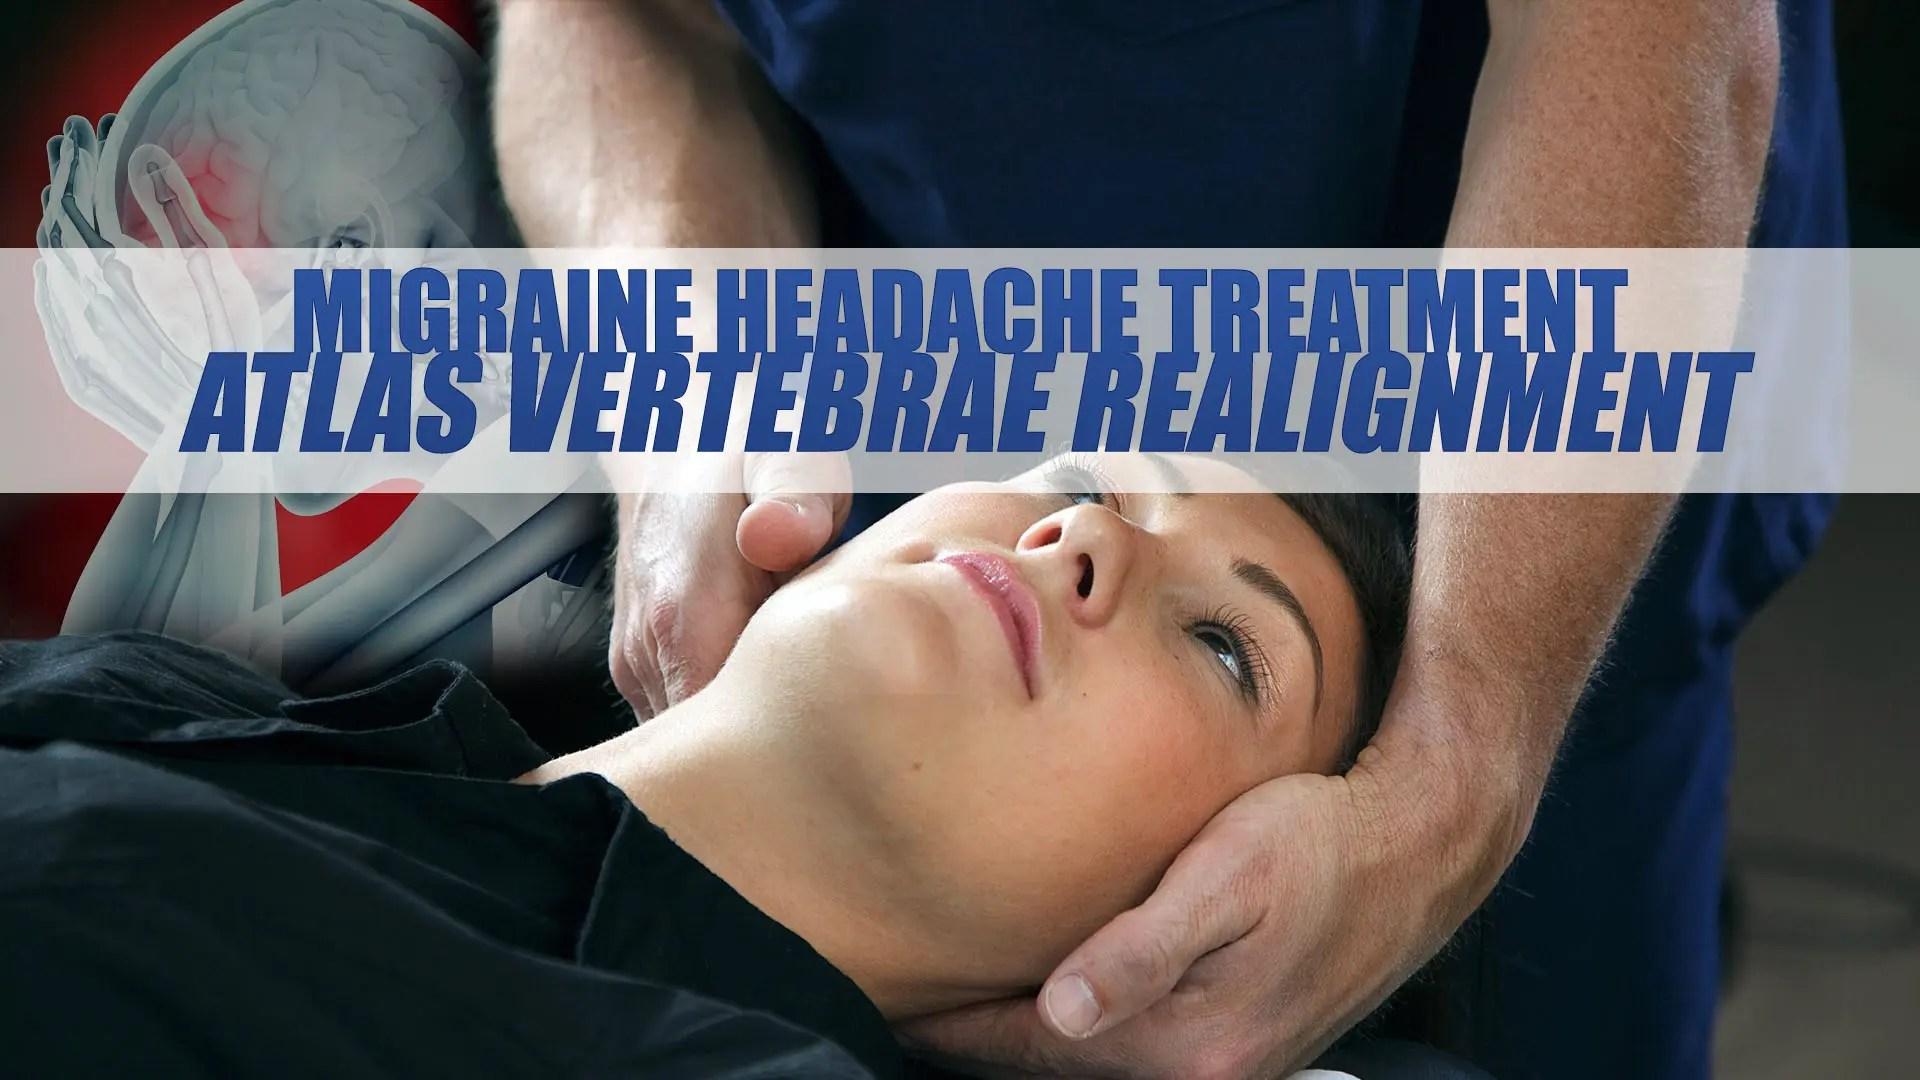 dolore pelvico headaches medication